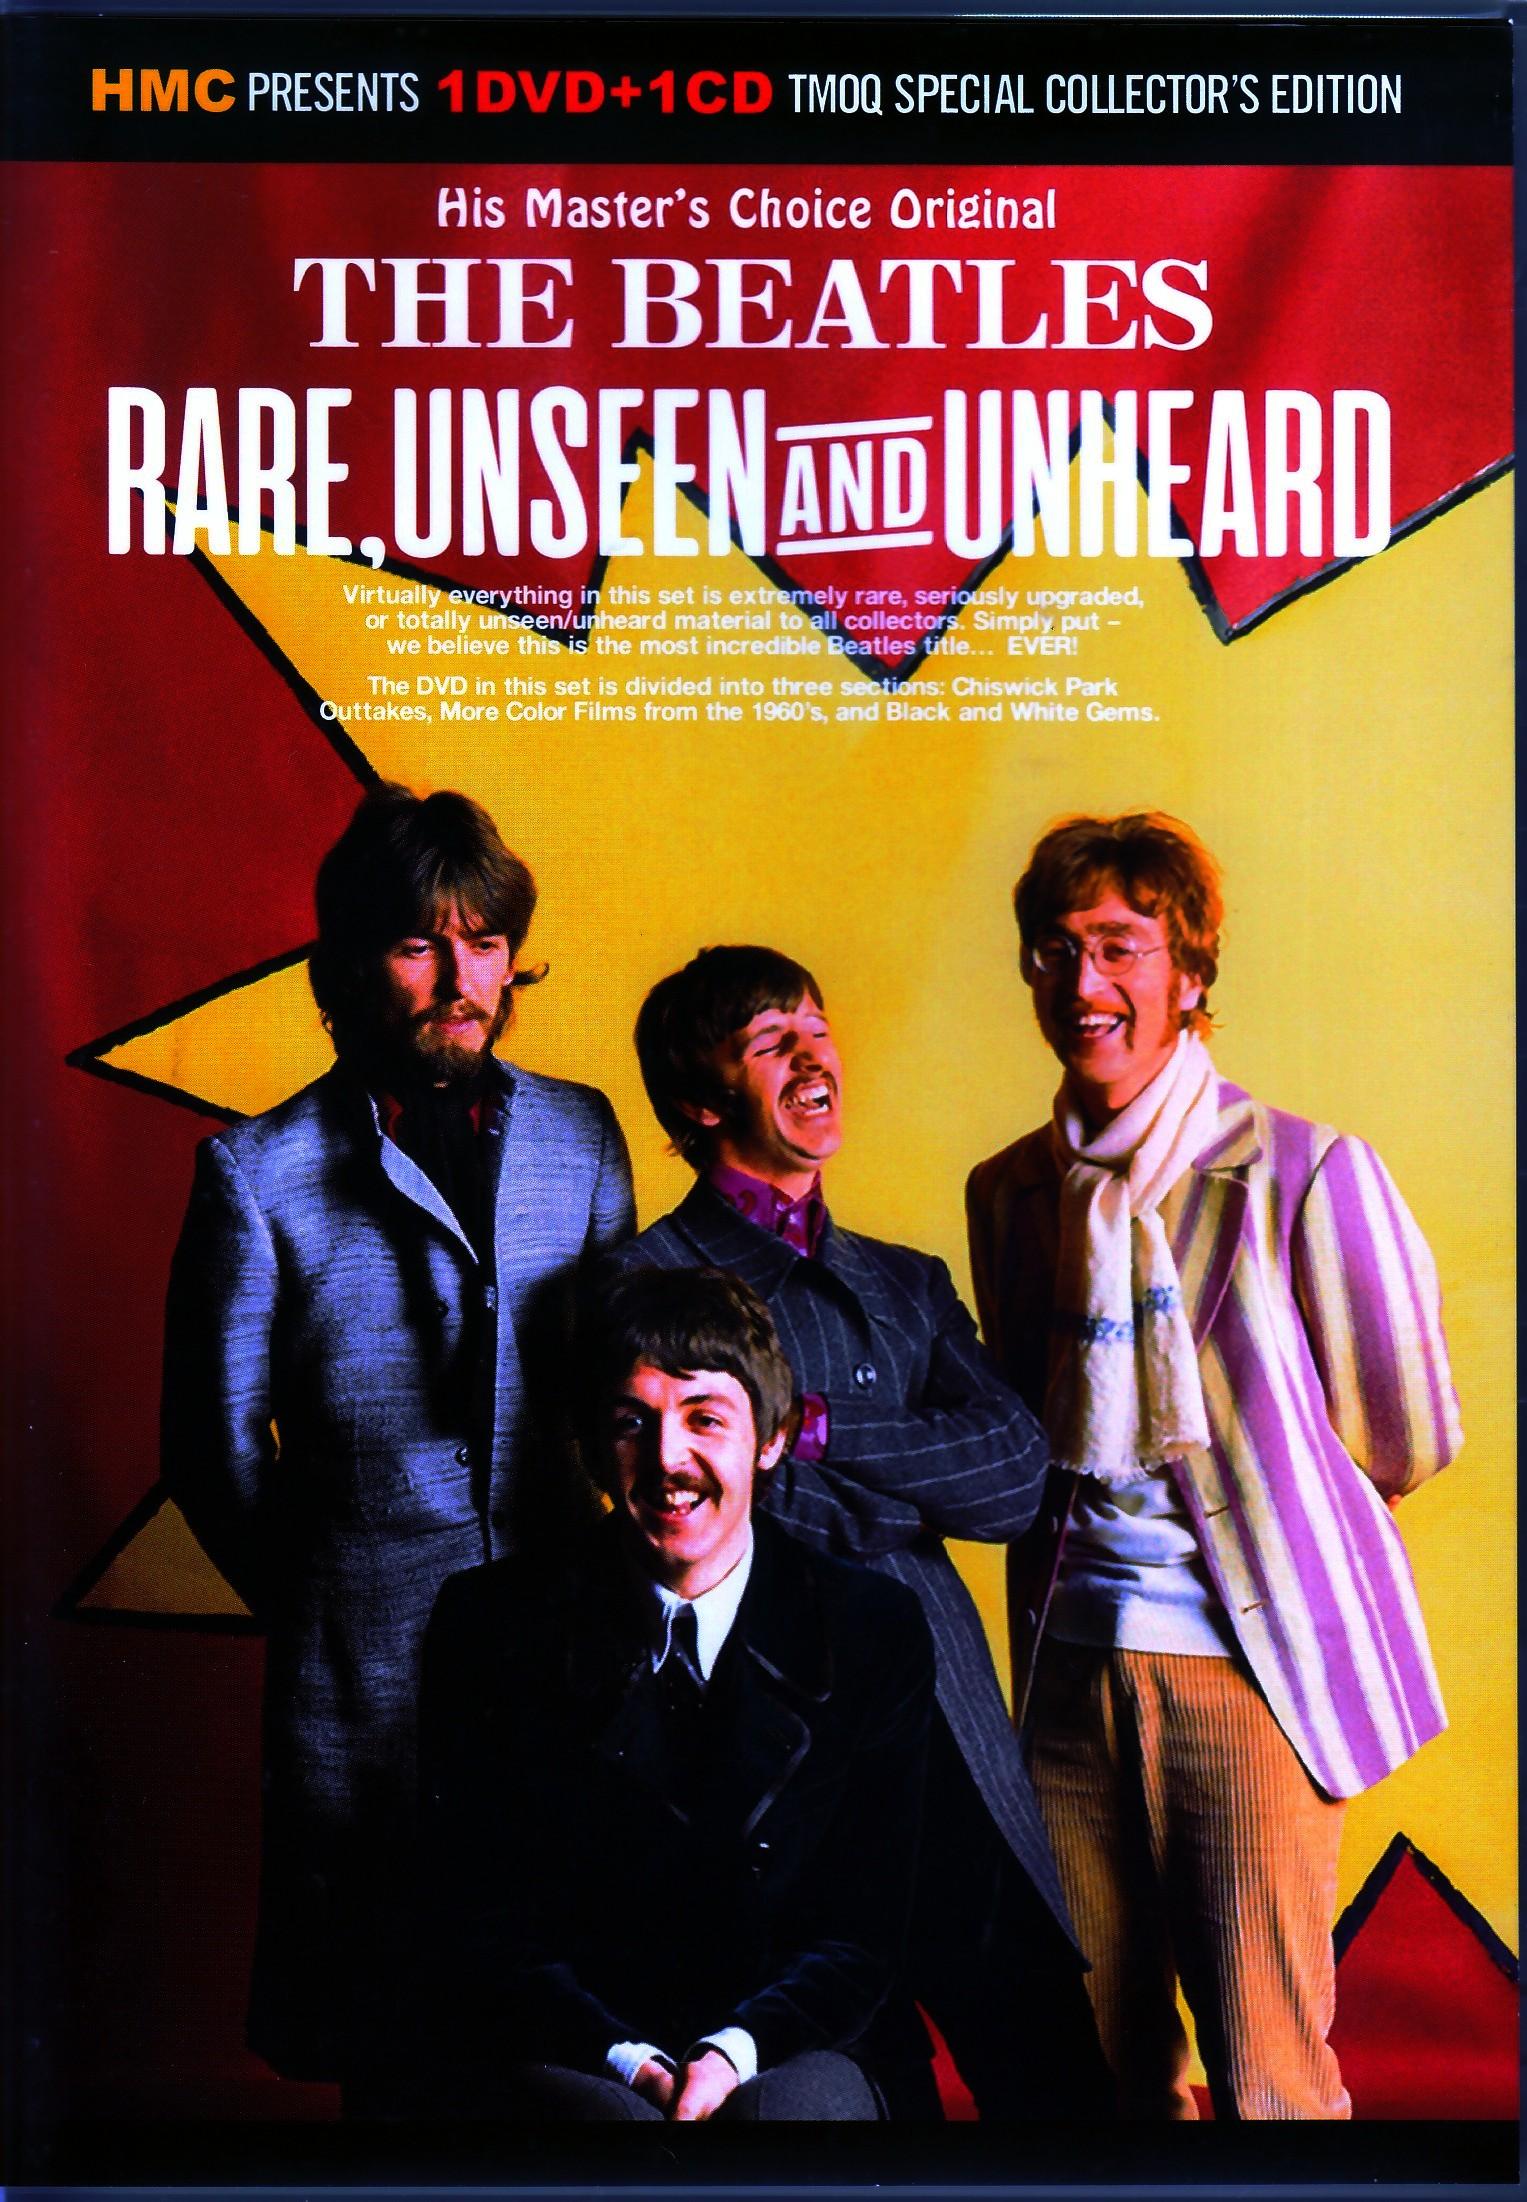 Beatles ビートルズ/Rare Unseen and Unheard